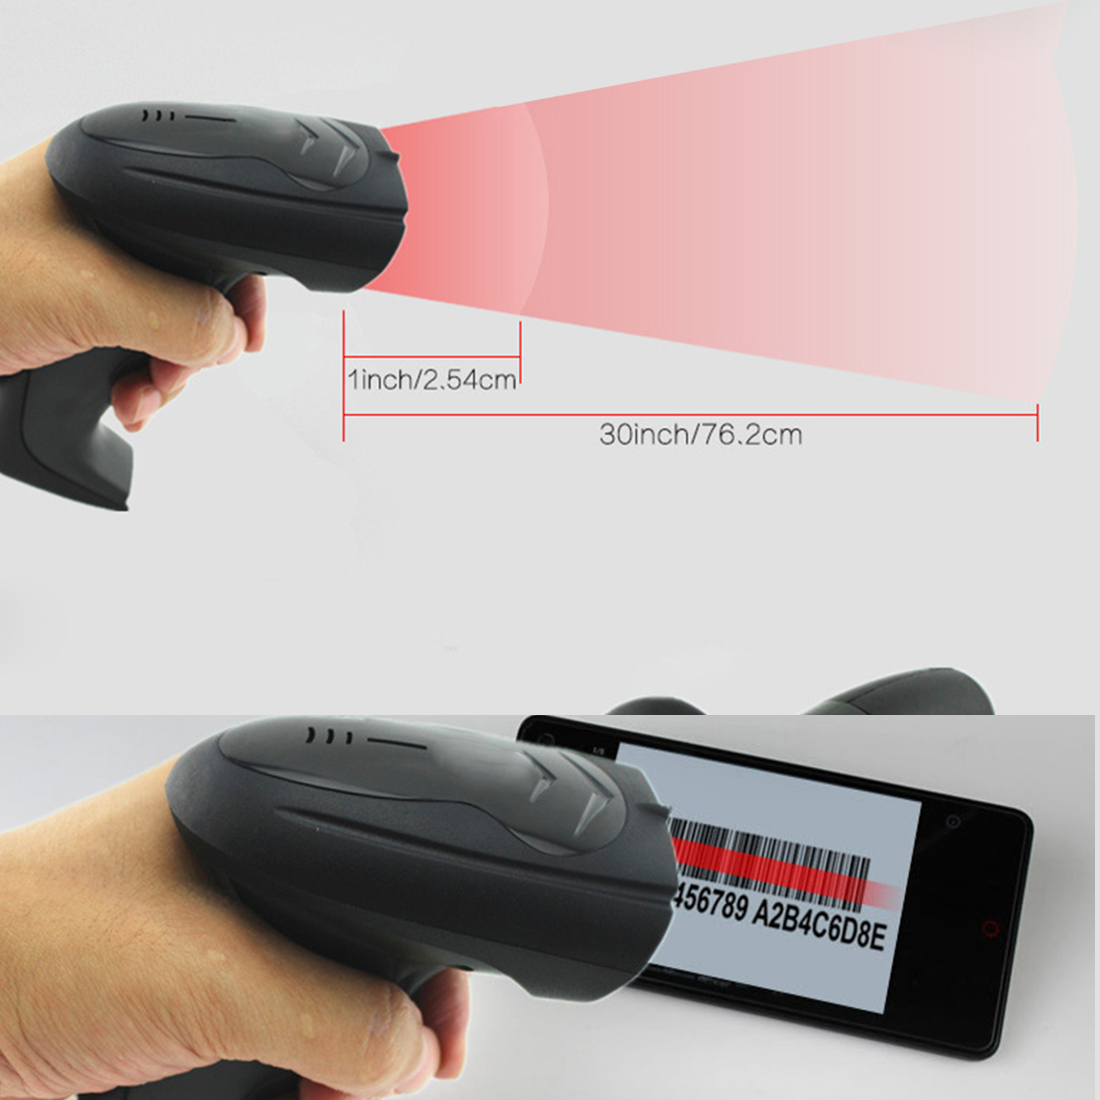 ФОТО New Wireless CCD Barcode Scanner Red Light Label Reader Handheld Barcode Scanning Gun for Supermarket Shop